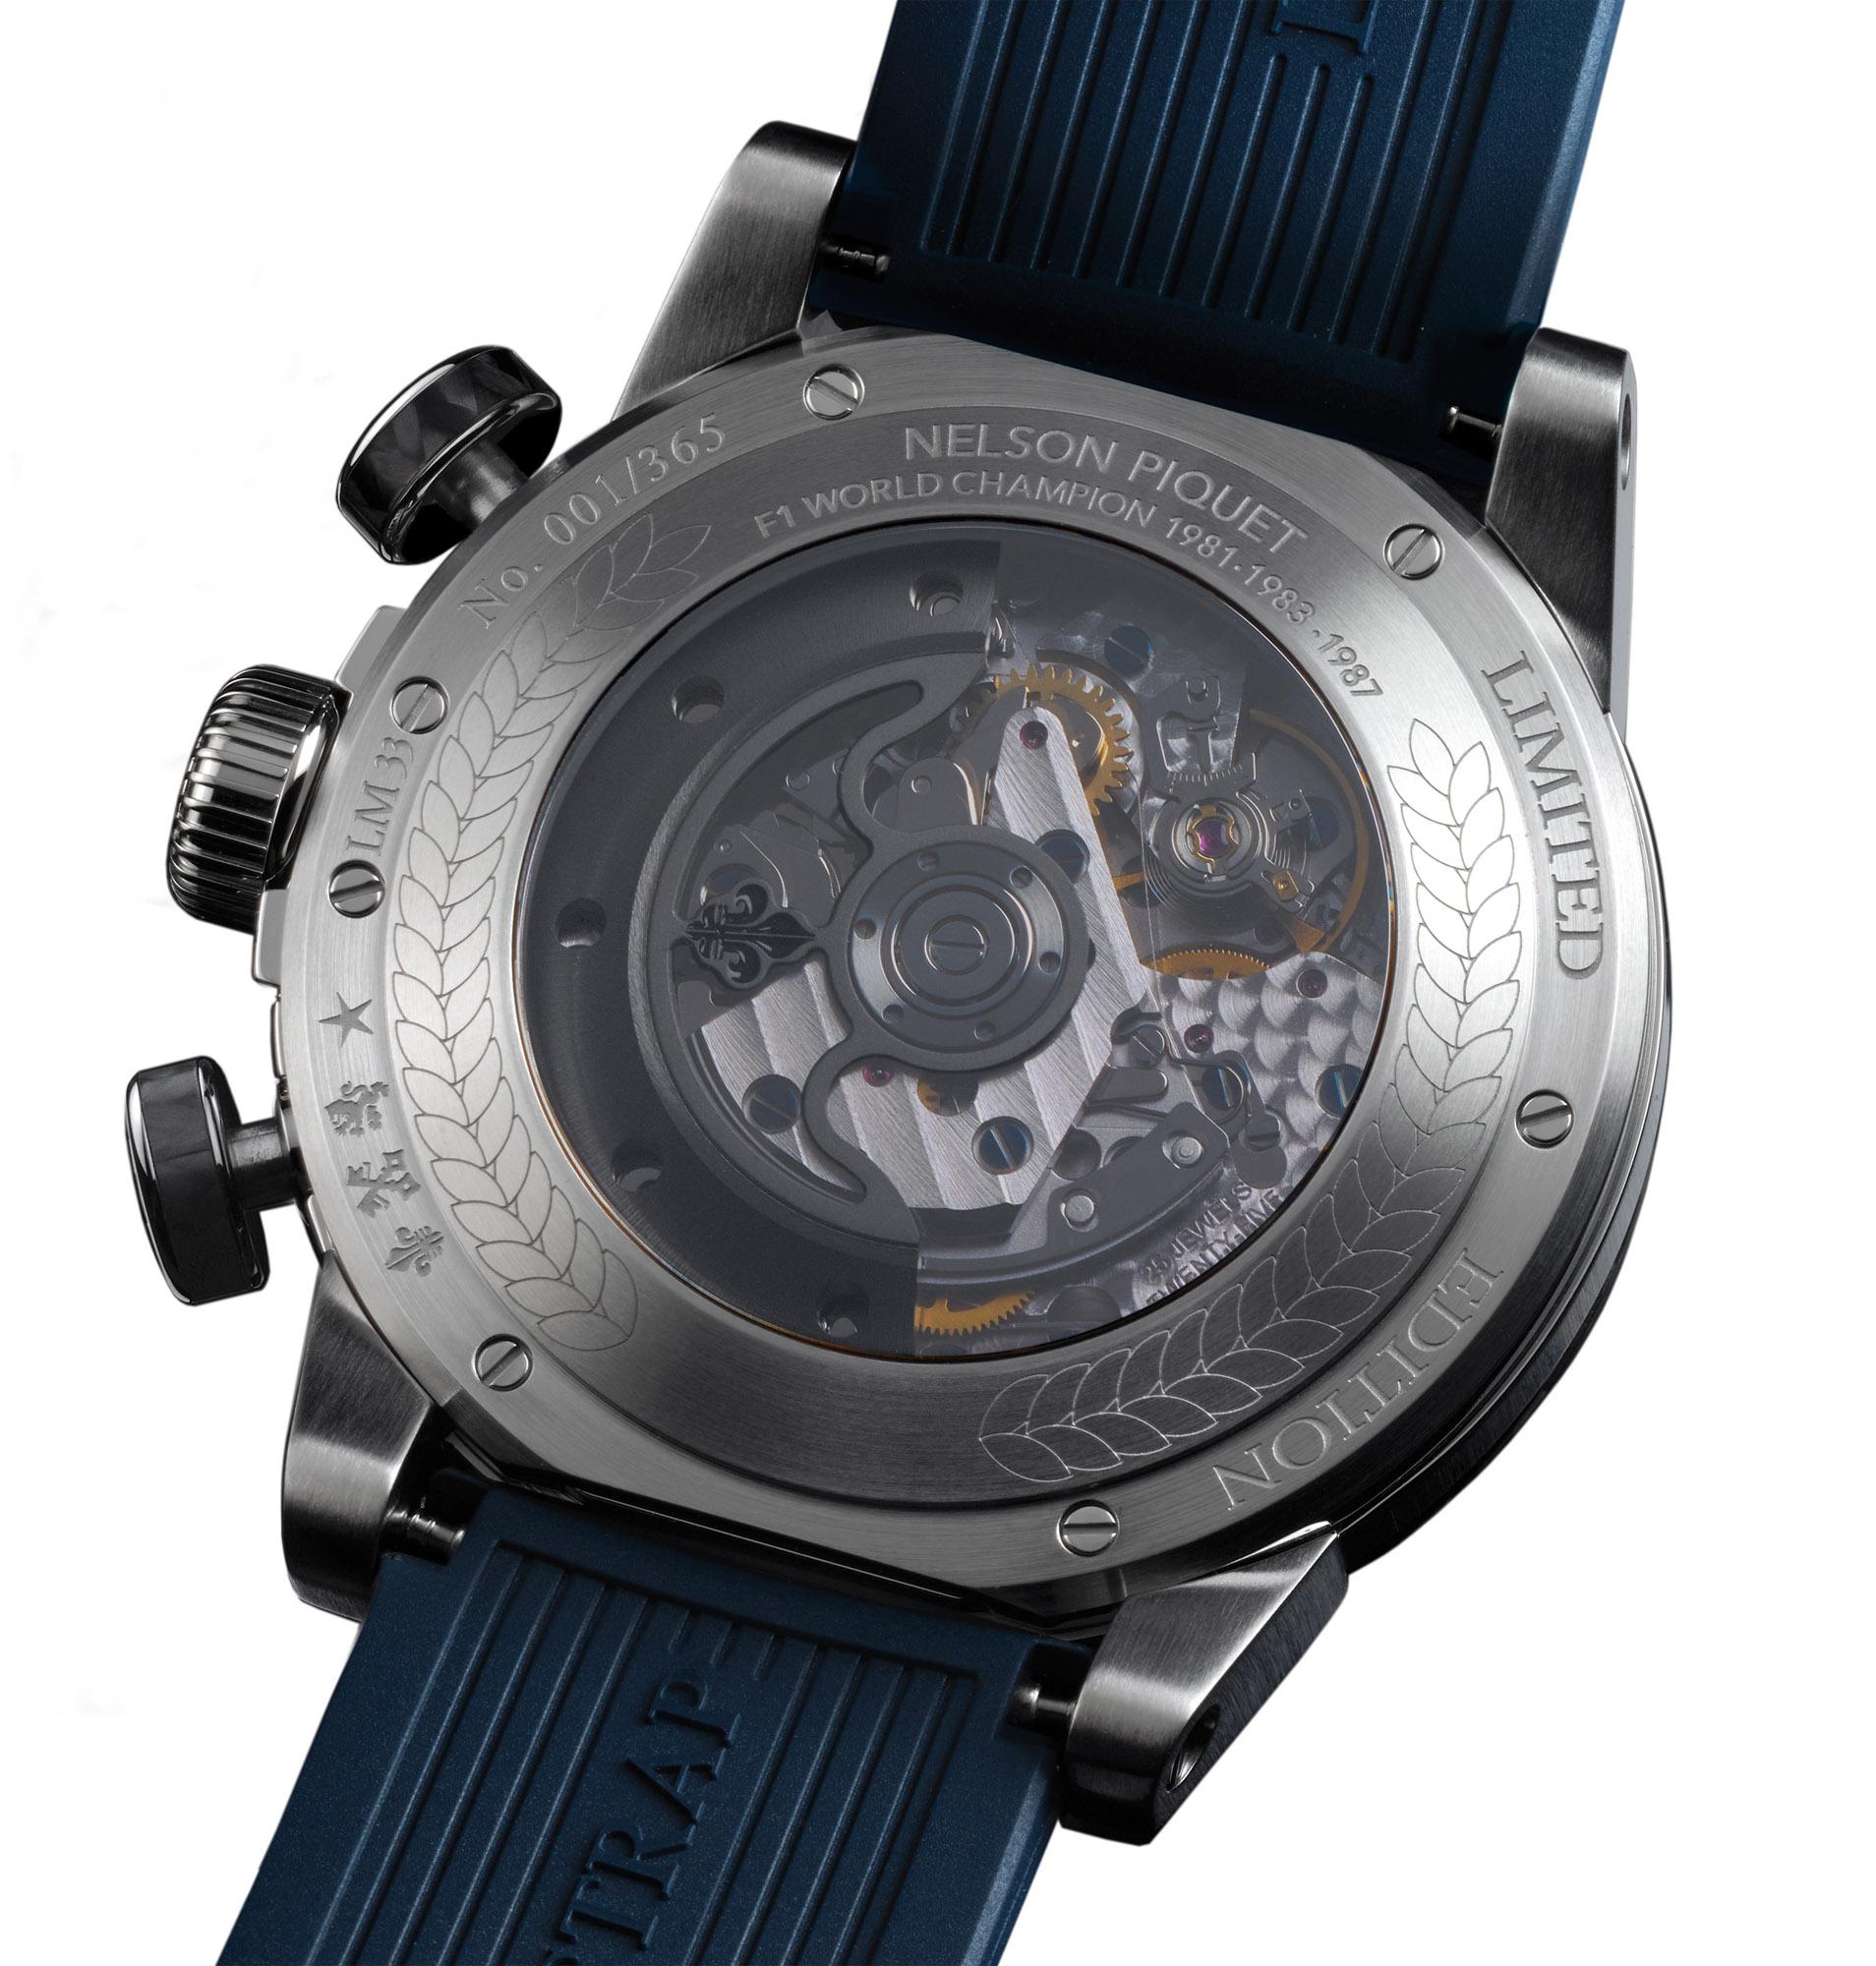 Louis Moinet Nelson Piquet Chronograph - Caseback